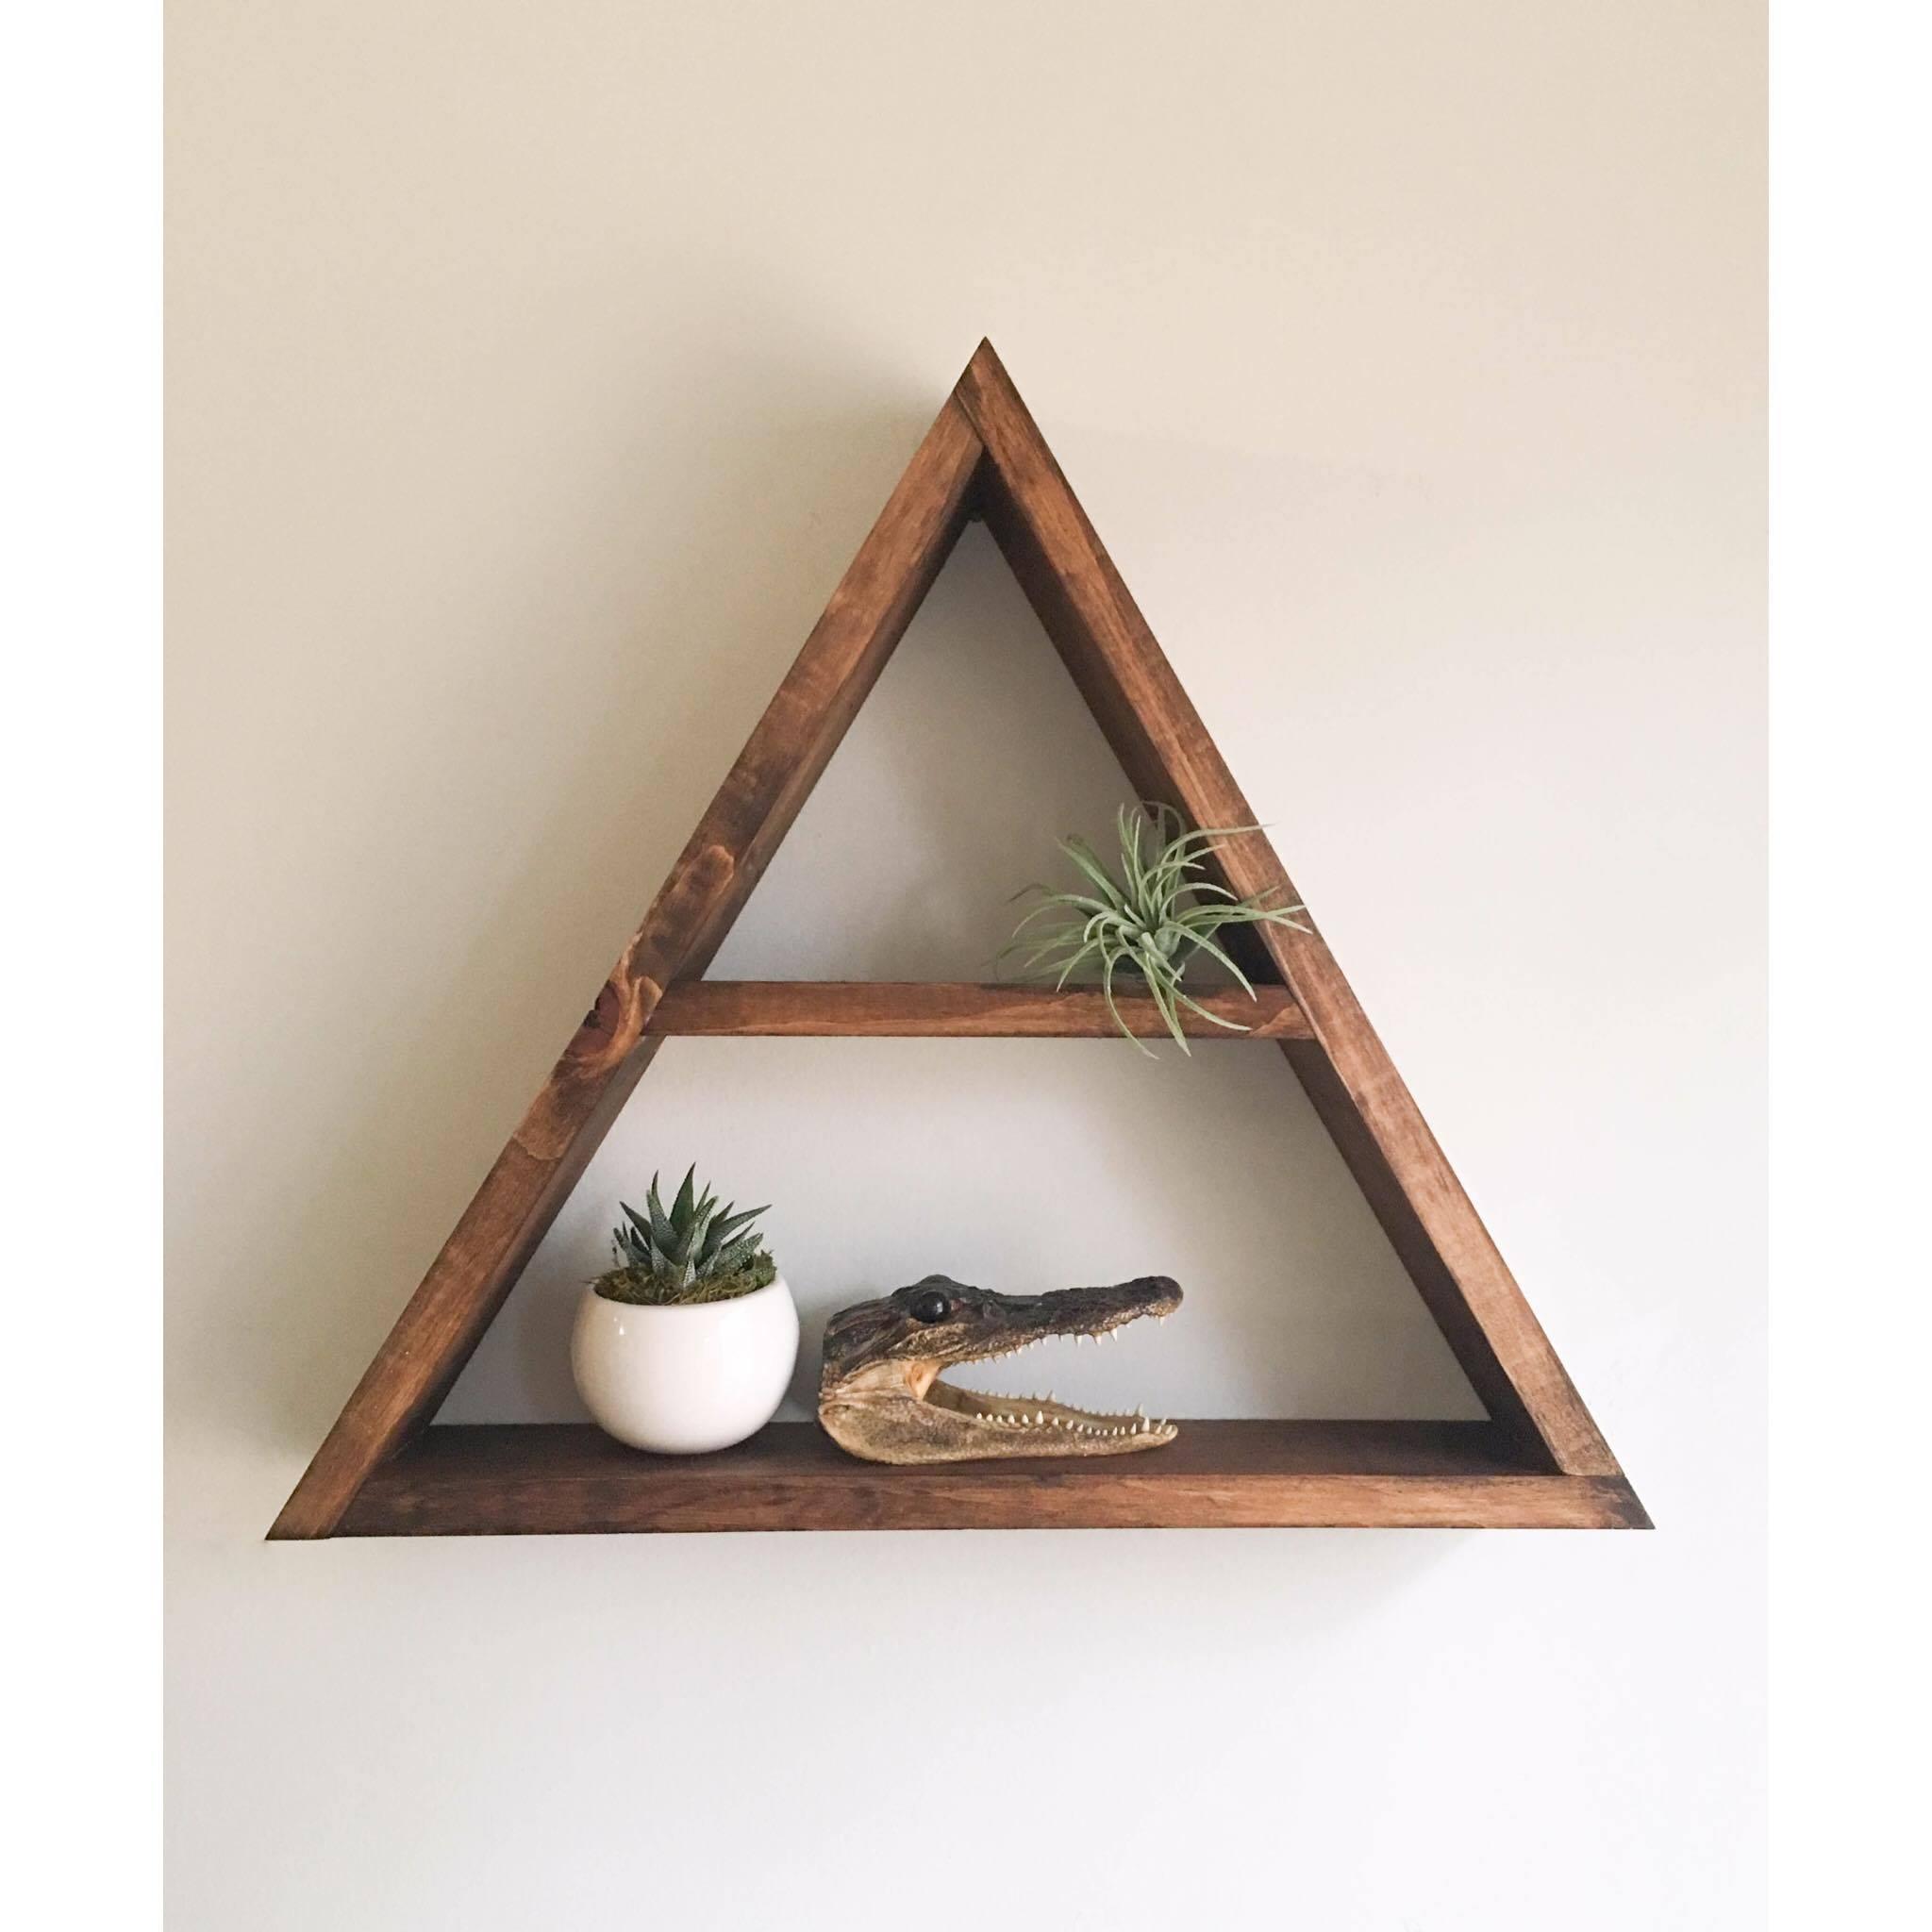 Triangle Shelf Crystal Shelf Shadow Box Wood Shelf